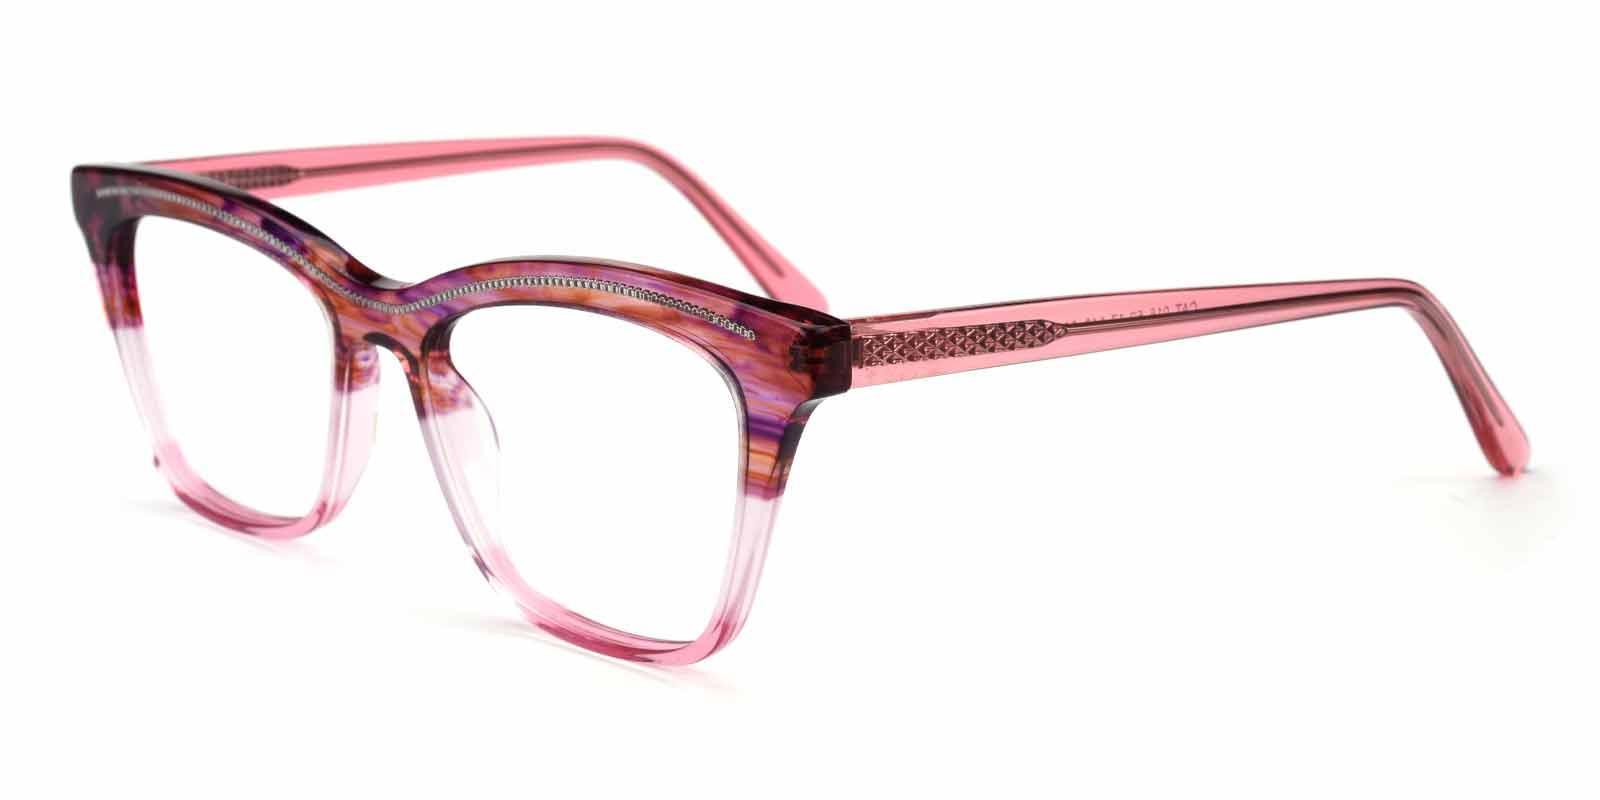 Tina-Red-Browline-Acetate-Eyeglasses-additional1